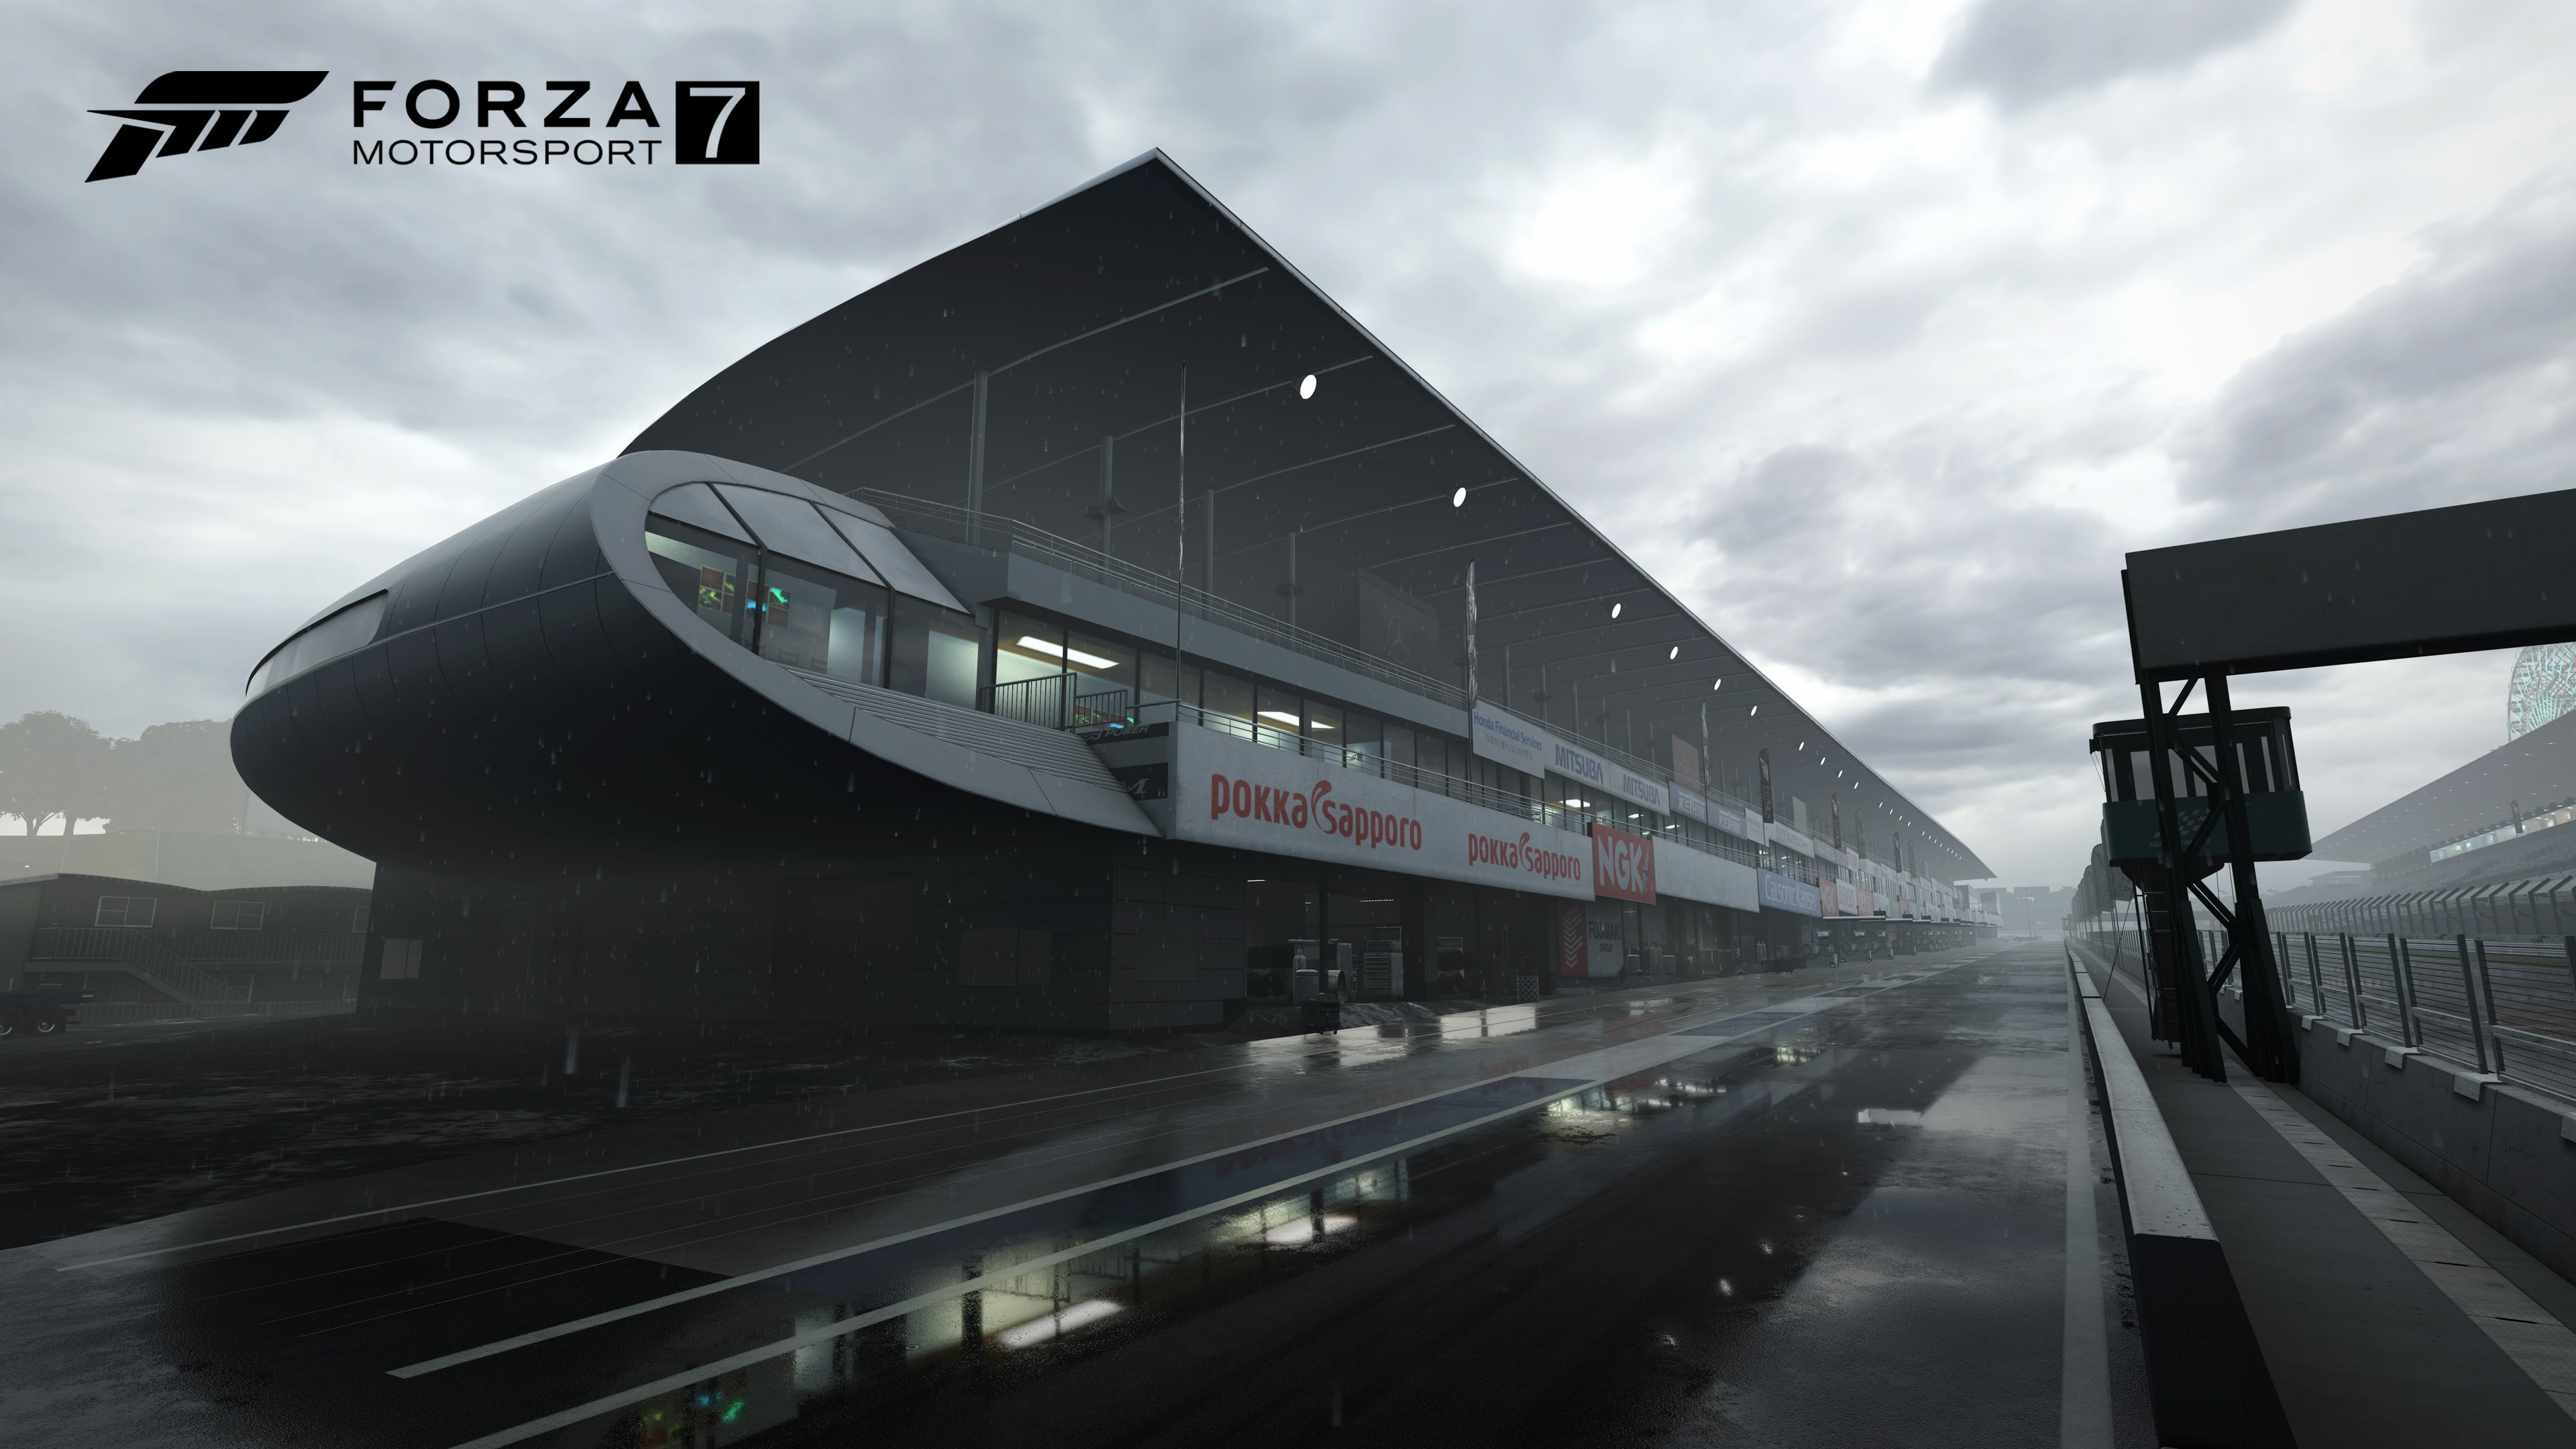 FM7 Track Reveal Suzuka Circuit